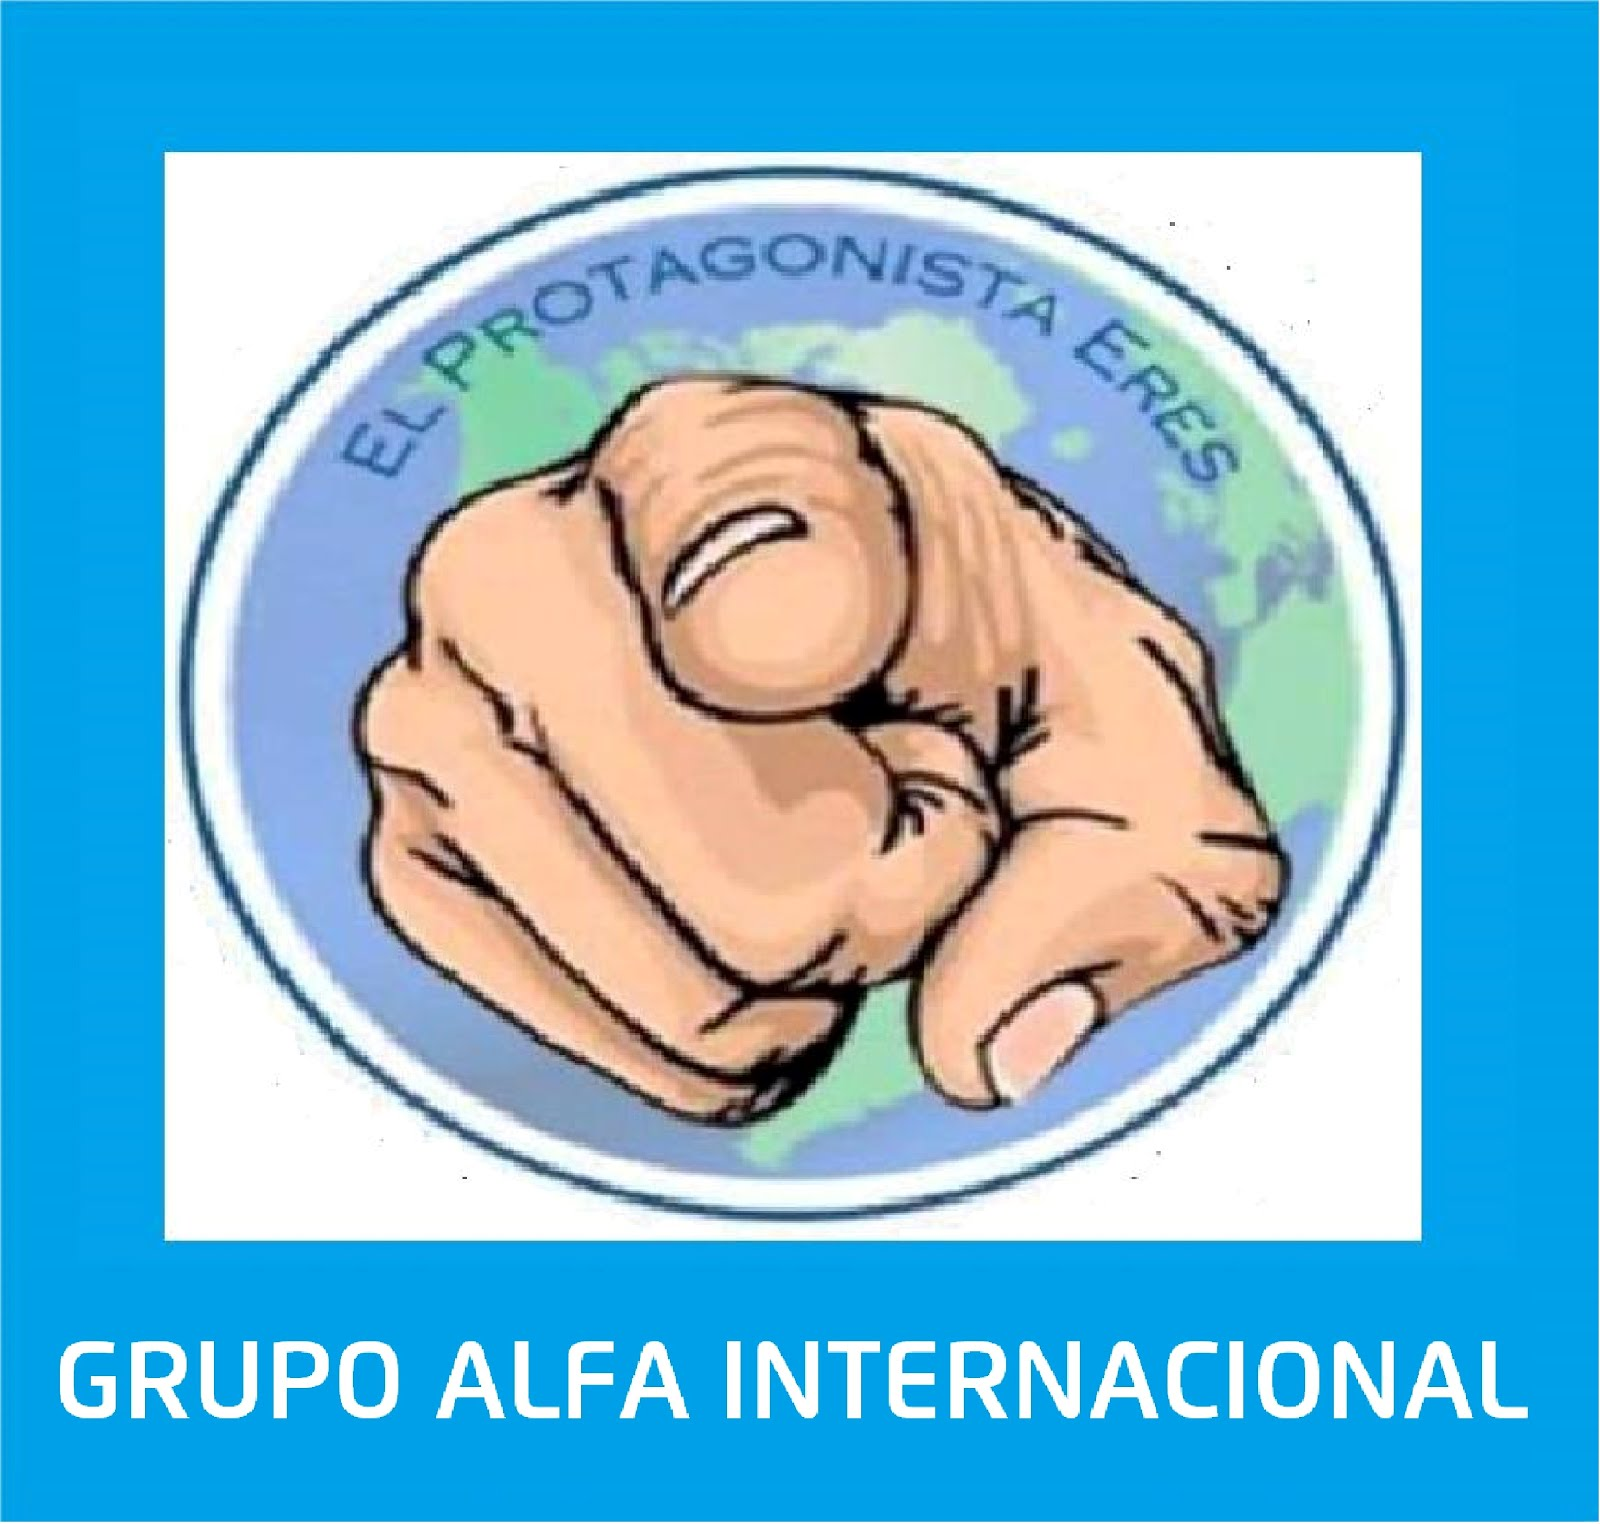 GANOLIFE GRUPO ALFA INTERNACIONAL